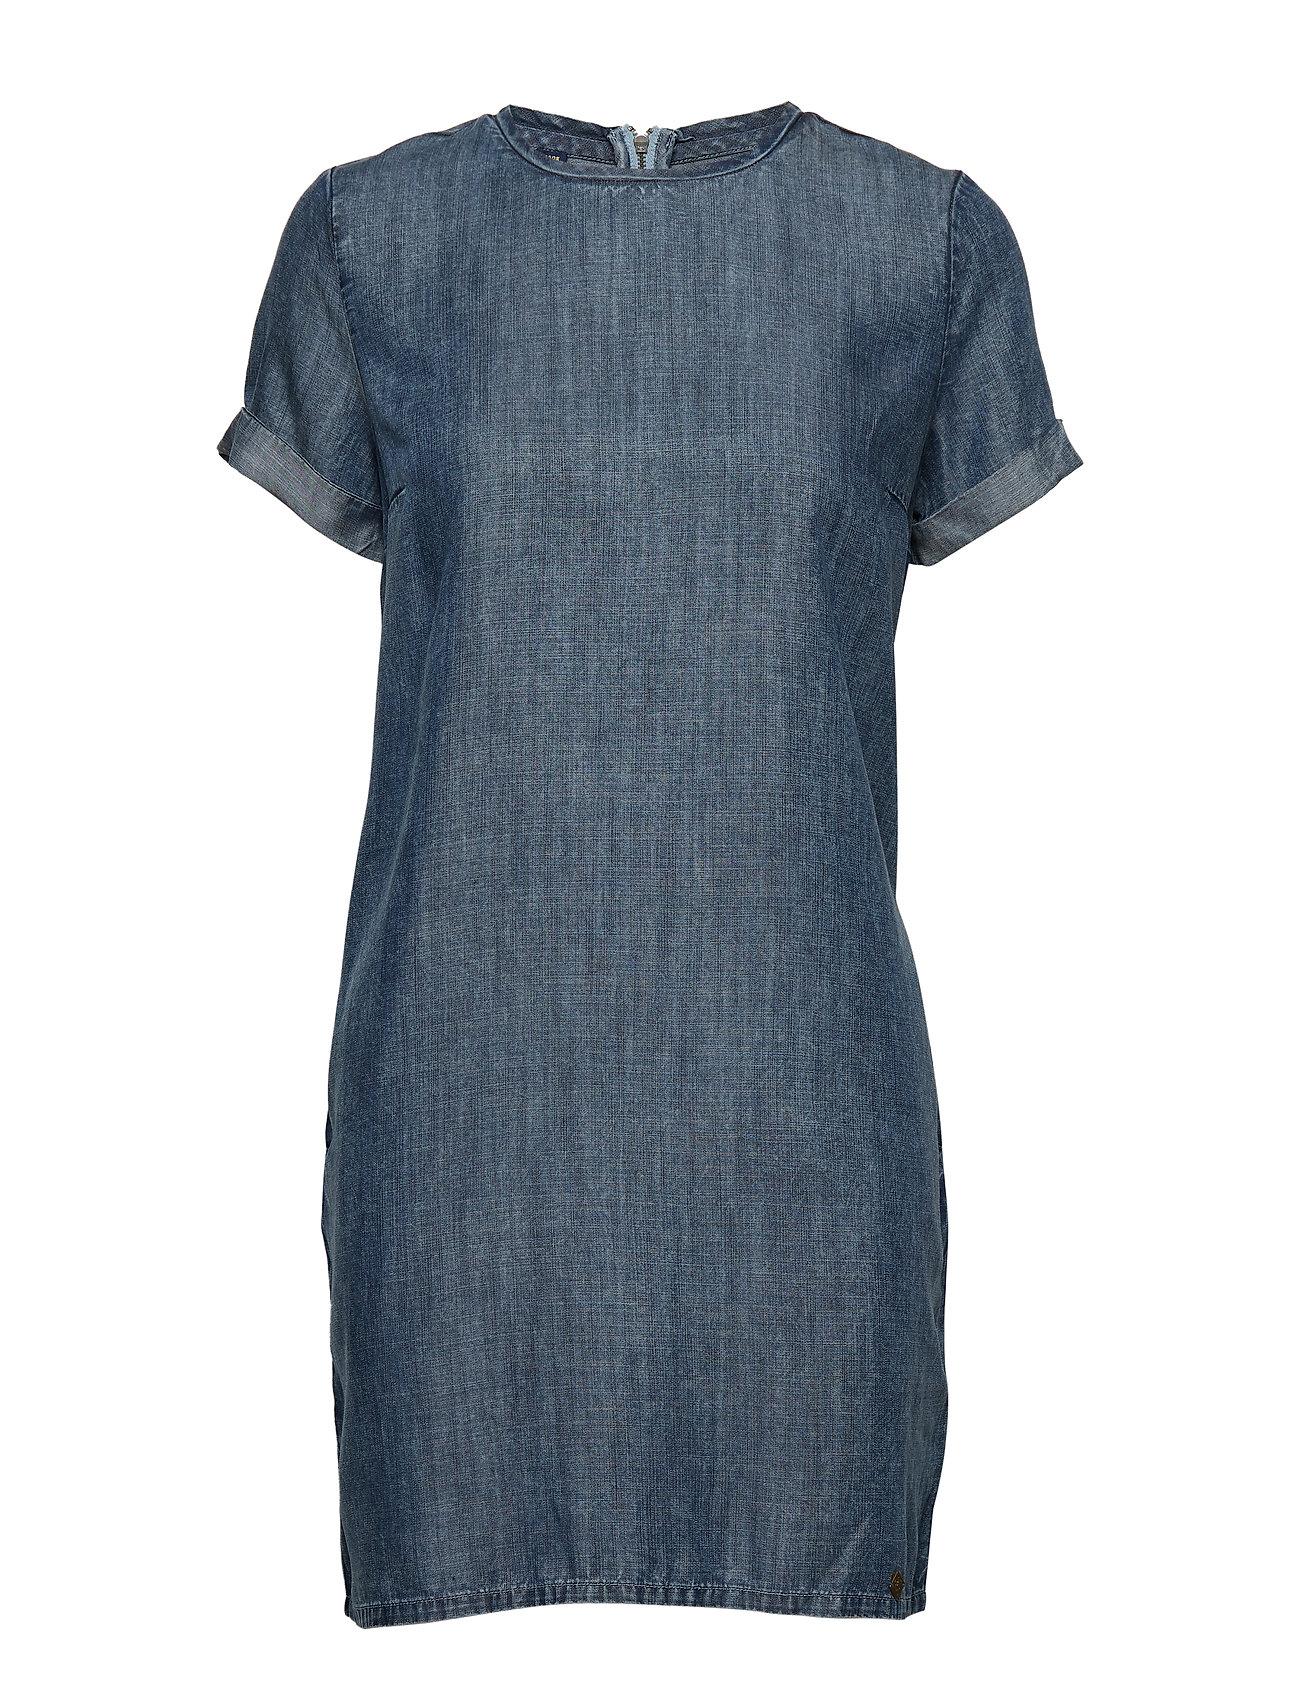 Superdry SHAY TEE DRESS - BLUE ACID WASH